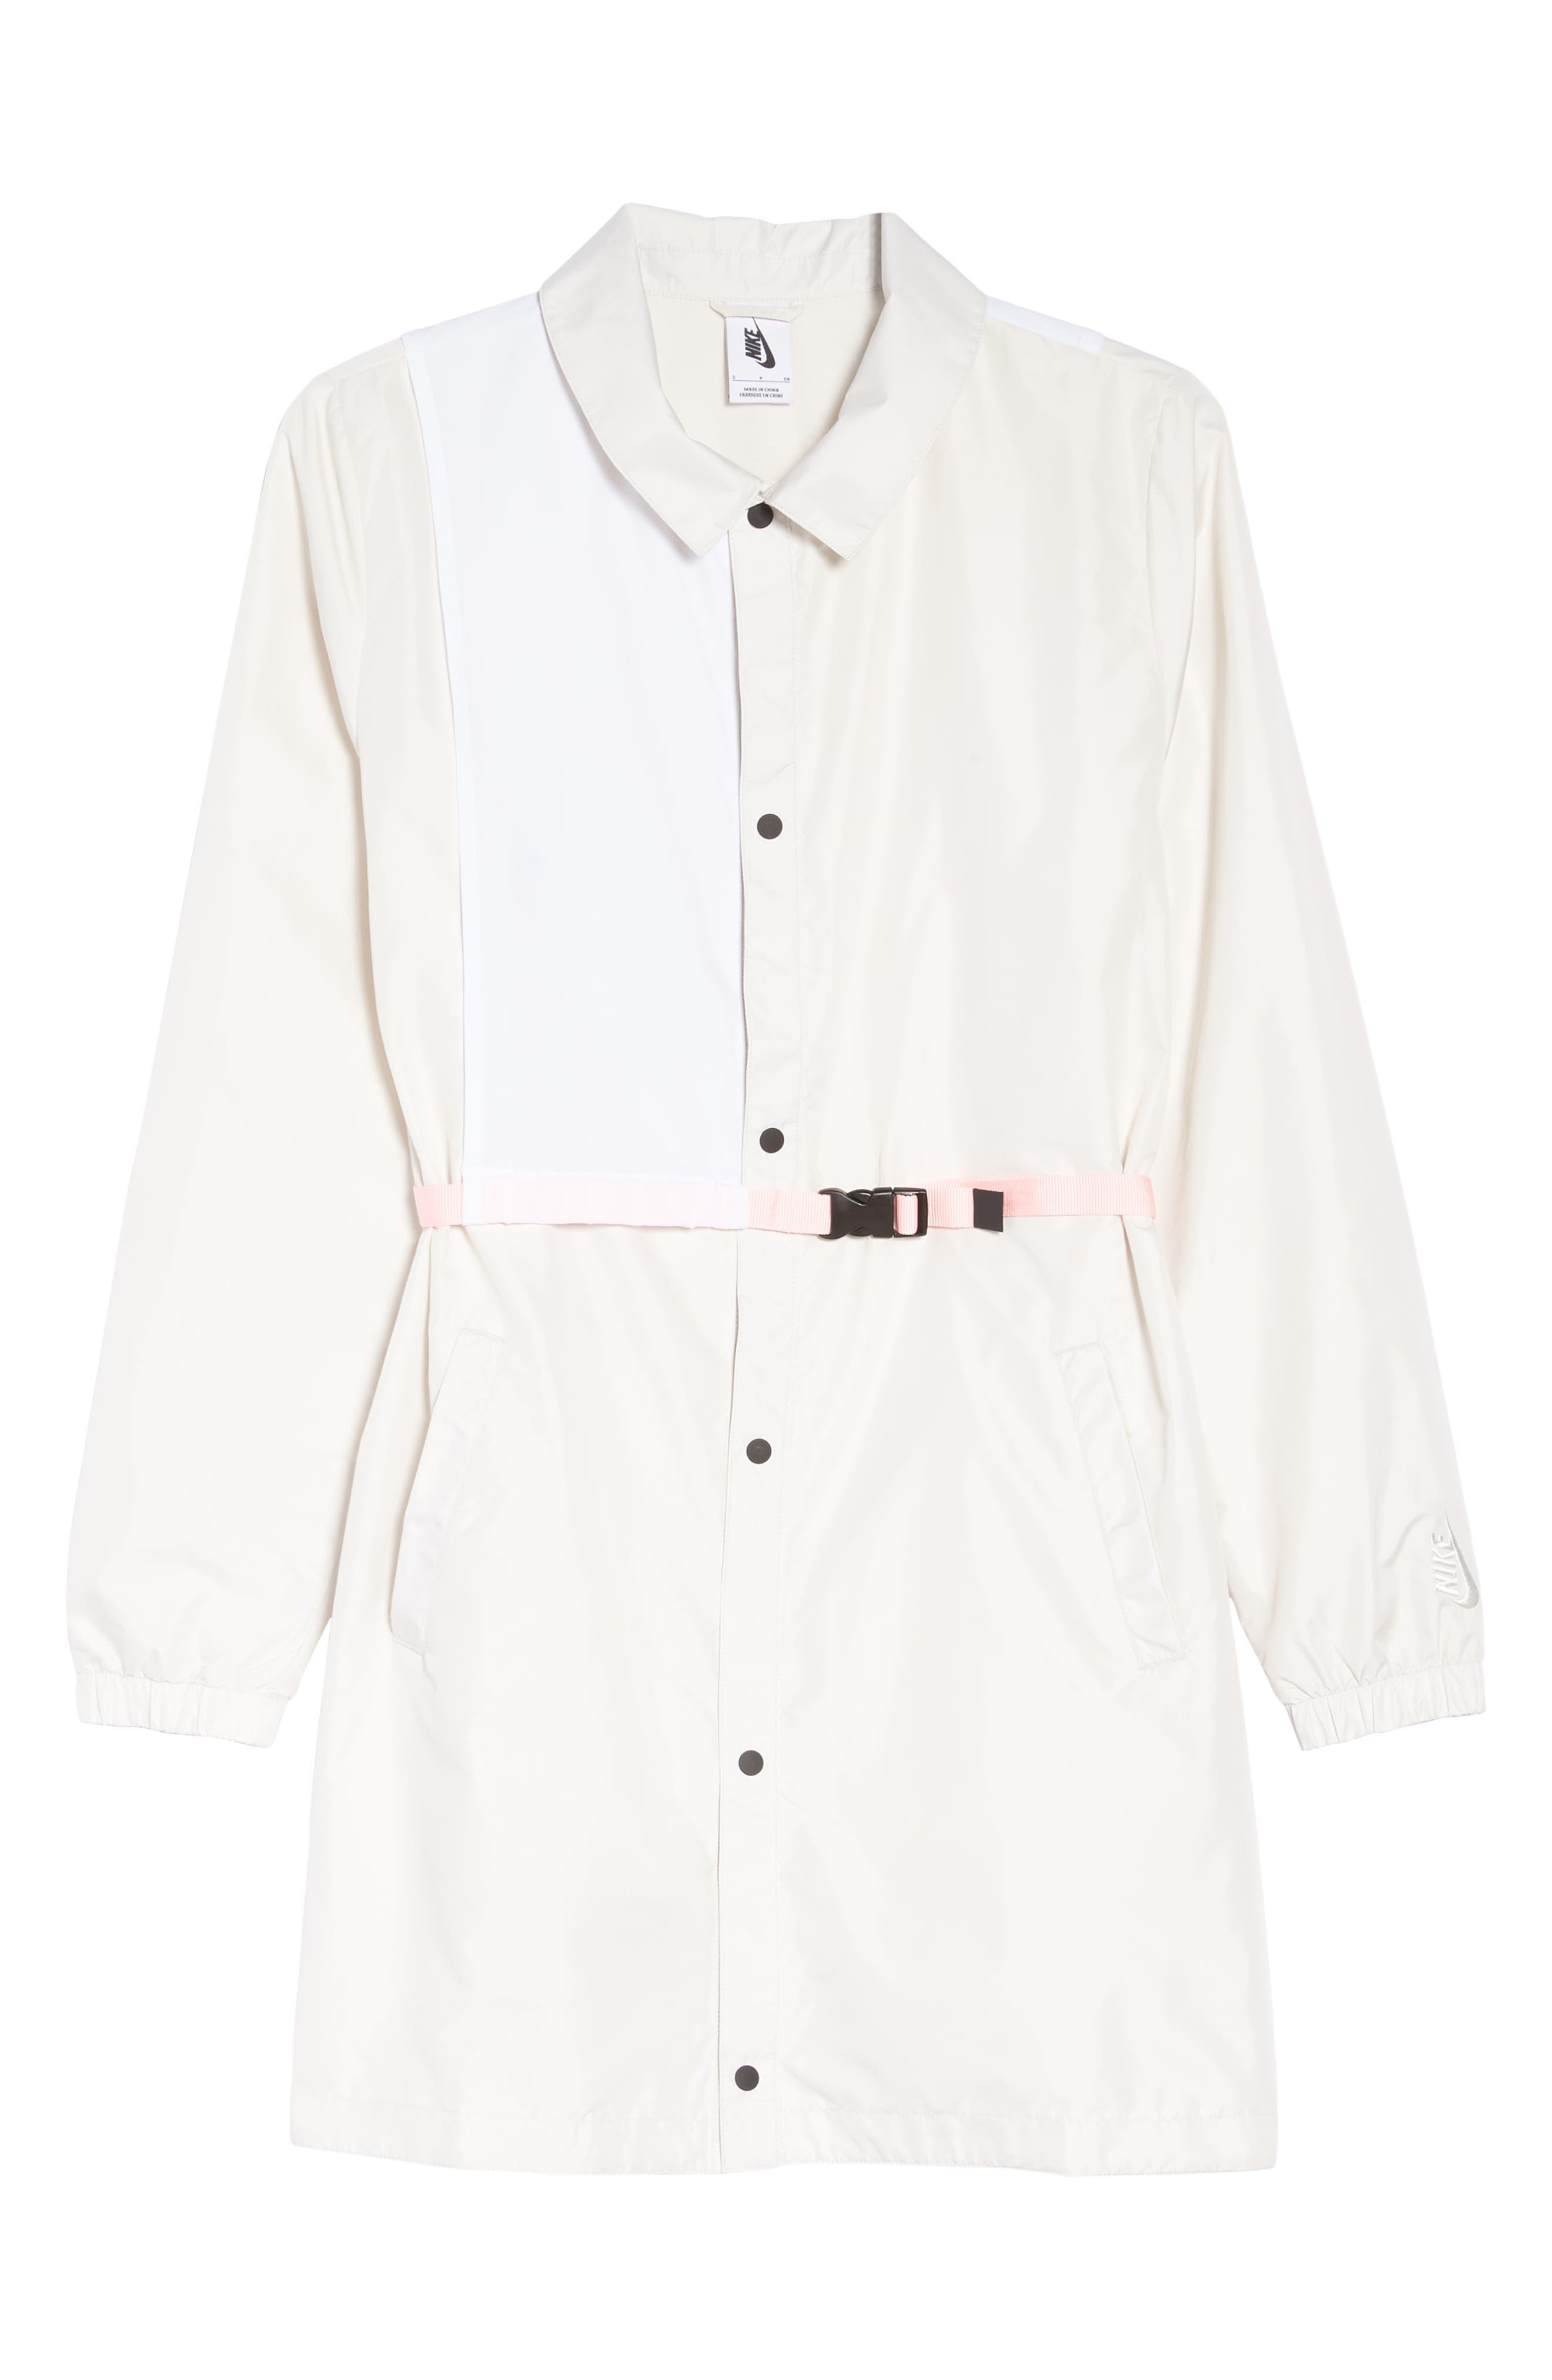 Hybrid Coaches Jacket/Dress,                             Alternate thumbnail 7, color,                             PHANTOM/ WHITE/ ARCTIC PUNCH